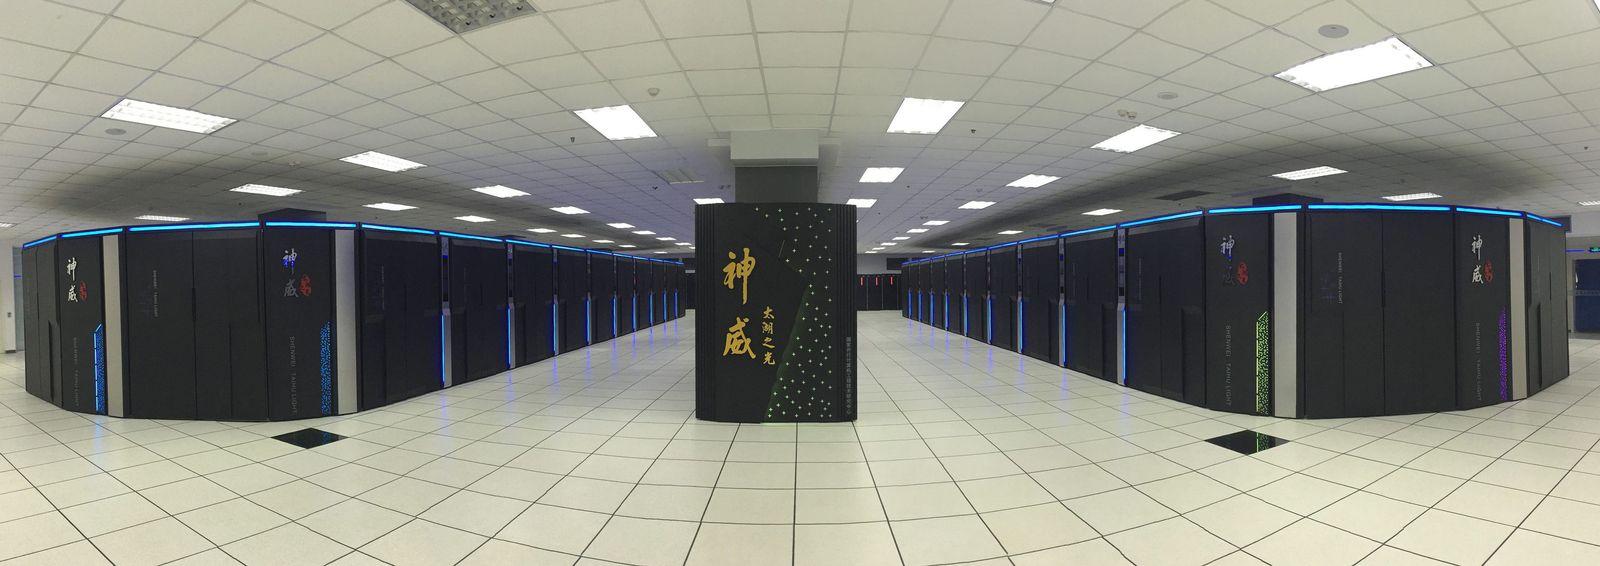 Sunway TaihuLight Supercomputer